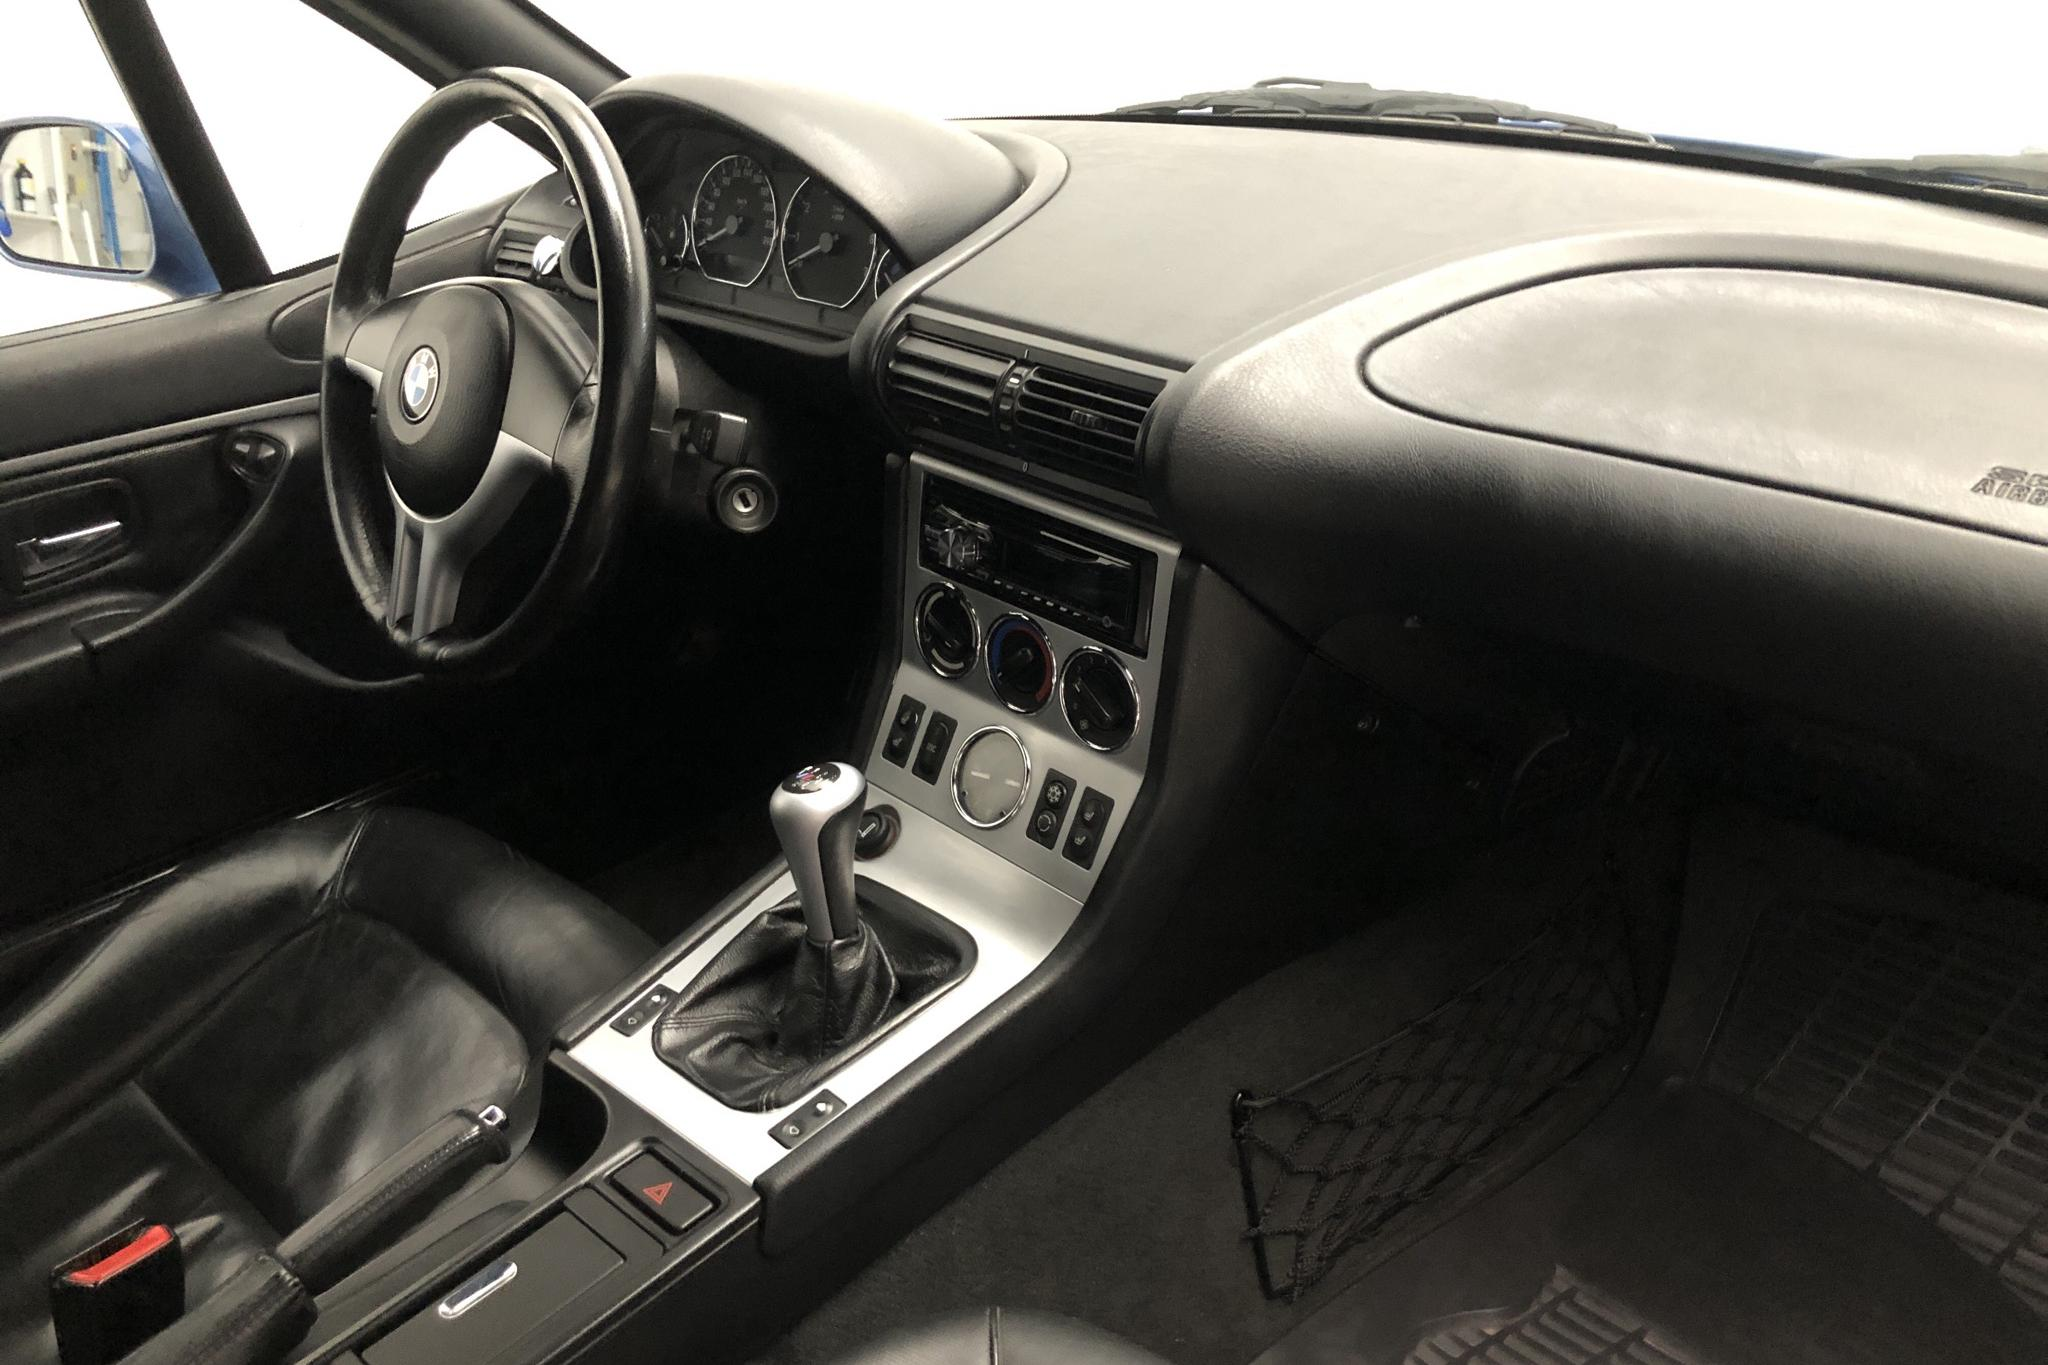 BMW Z3 2.2 Cabriolet (170hk) - 127 550 km - Manual - blue - 2001